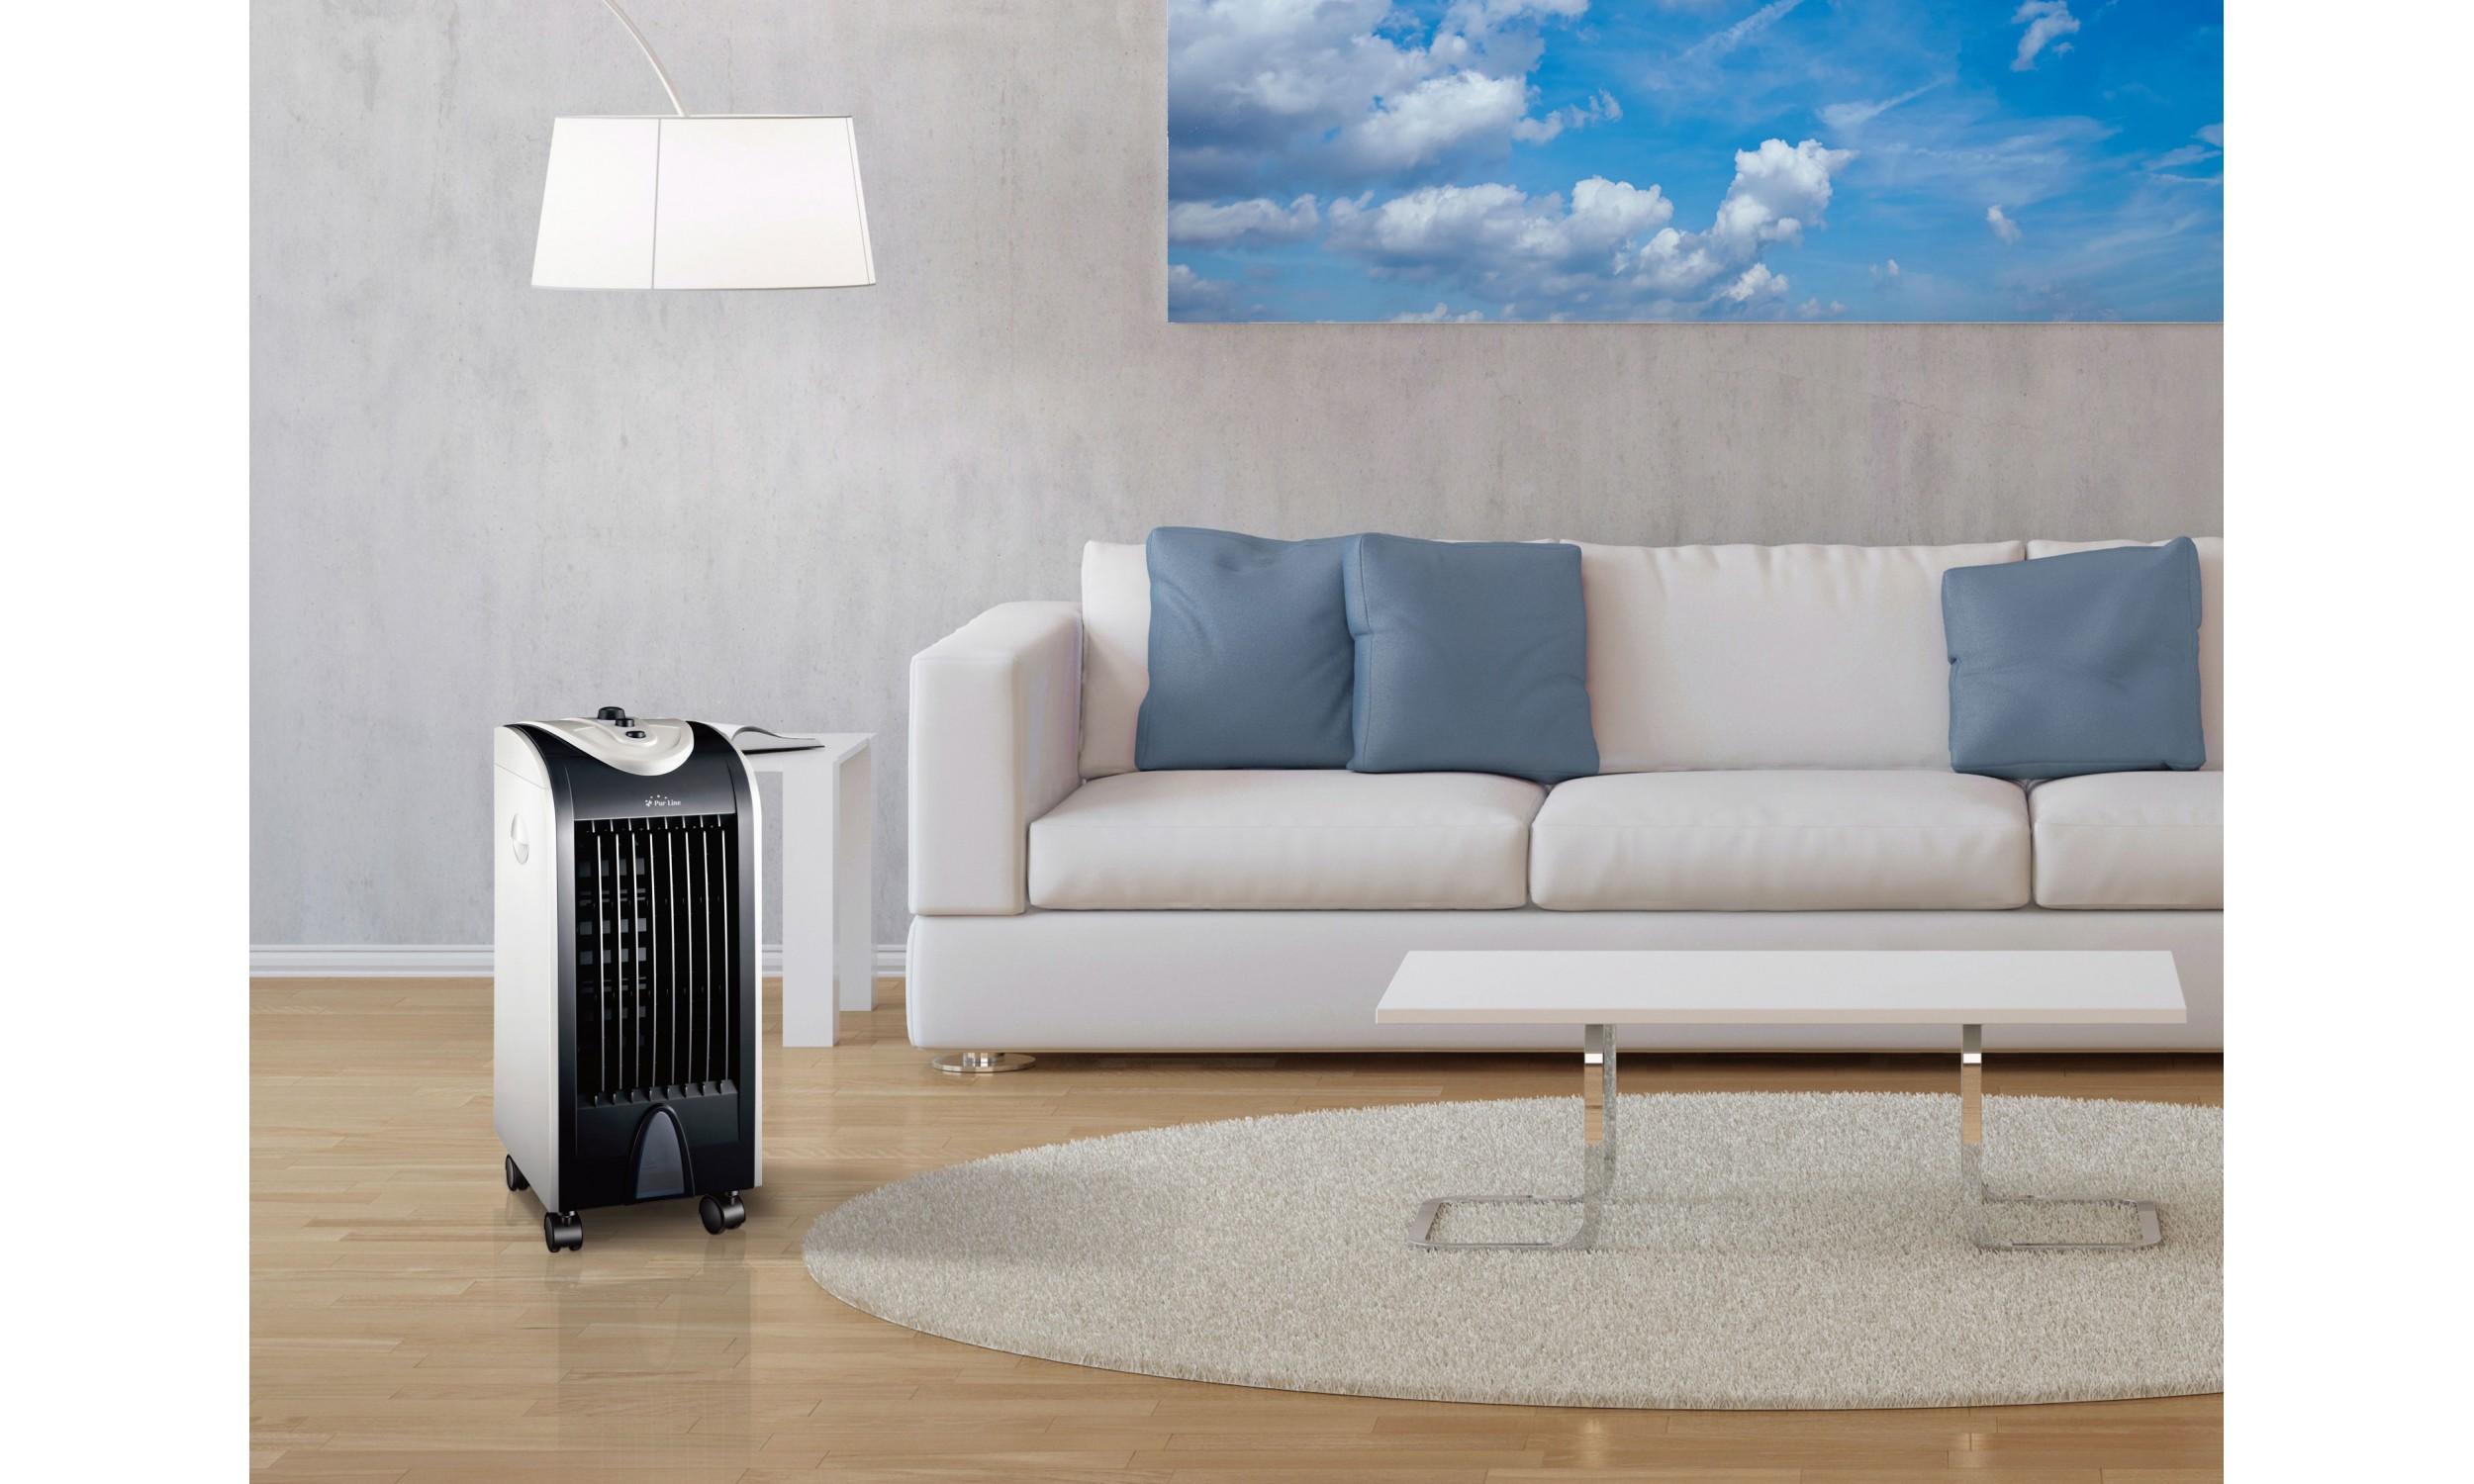 Evaporative air cooler Rafy 51